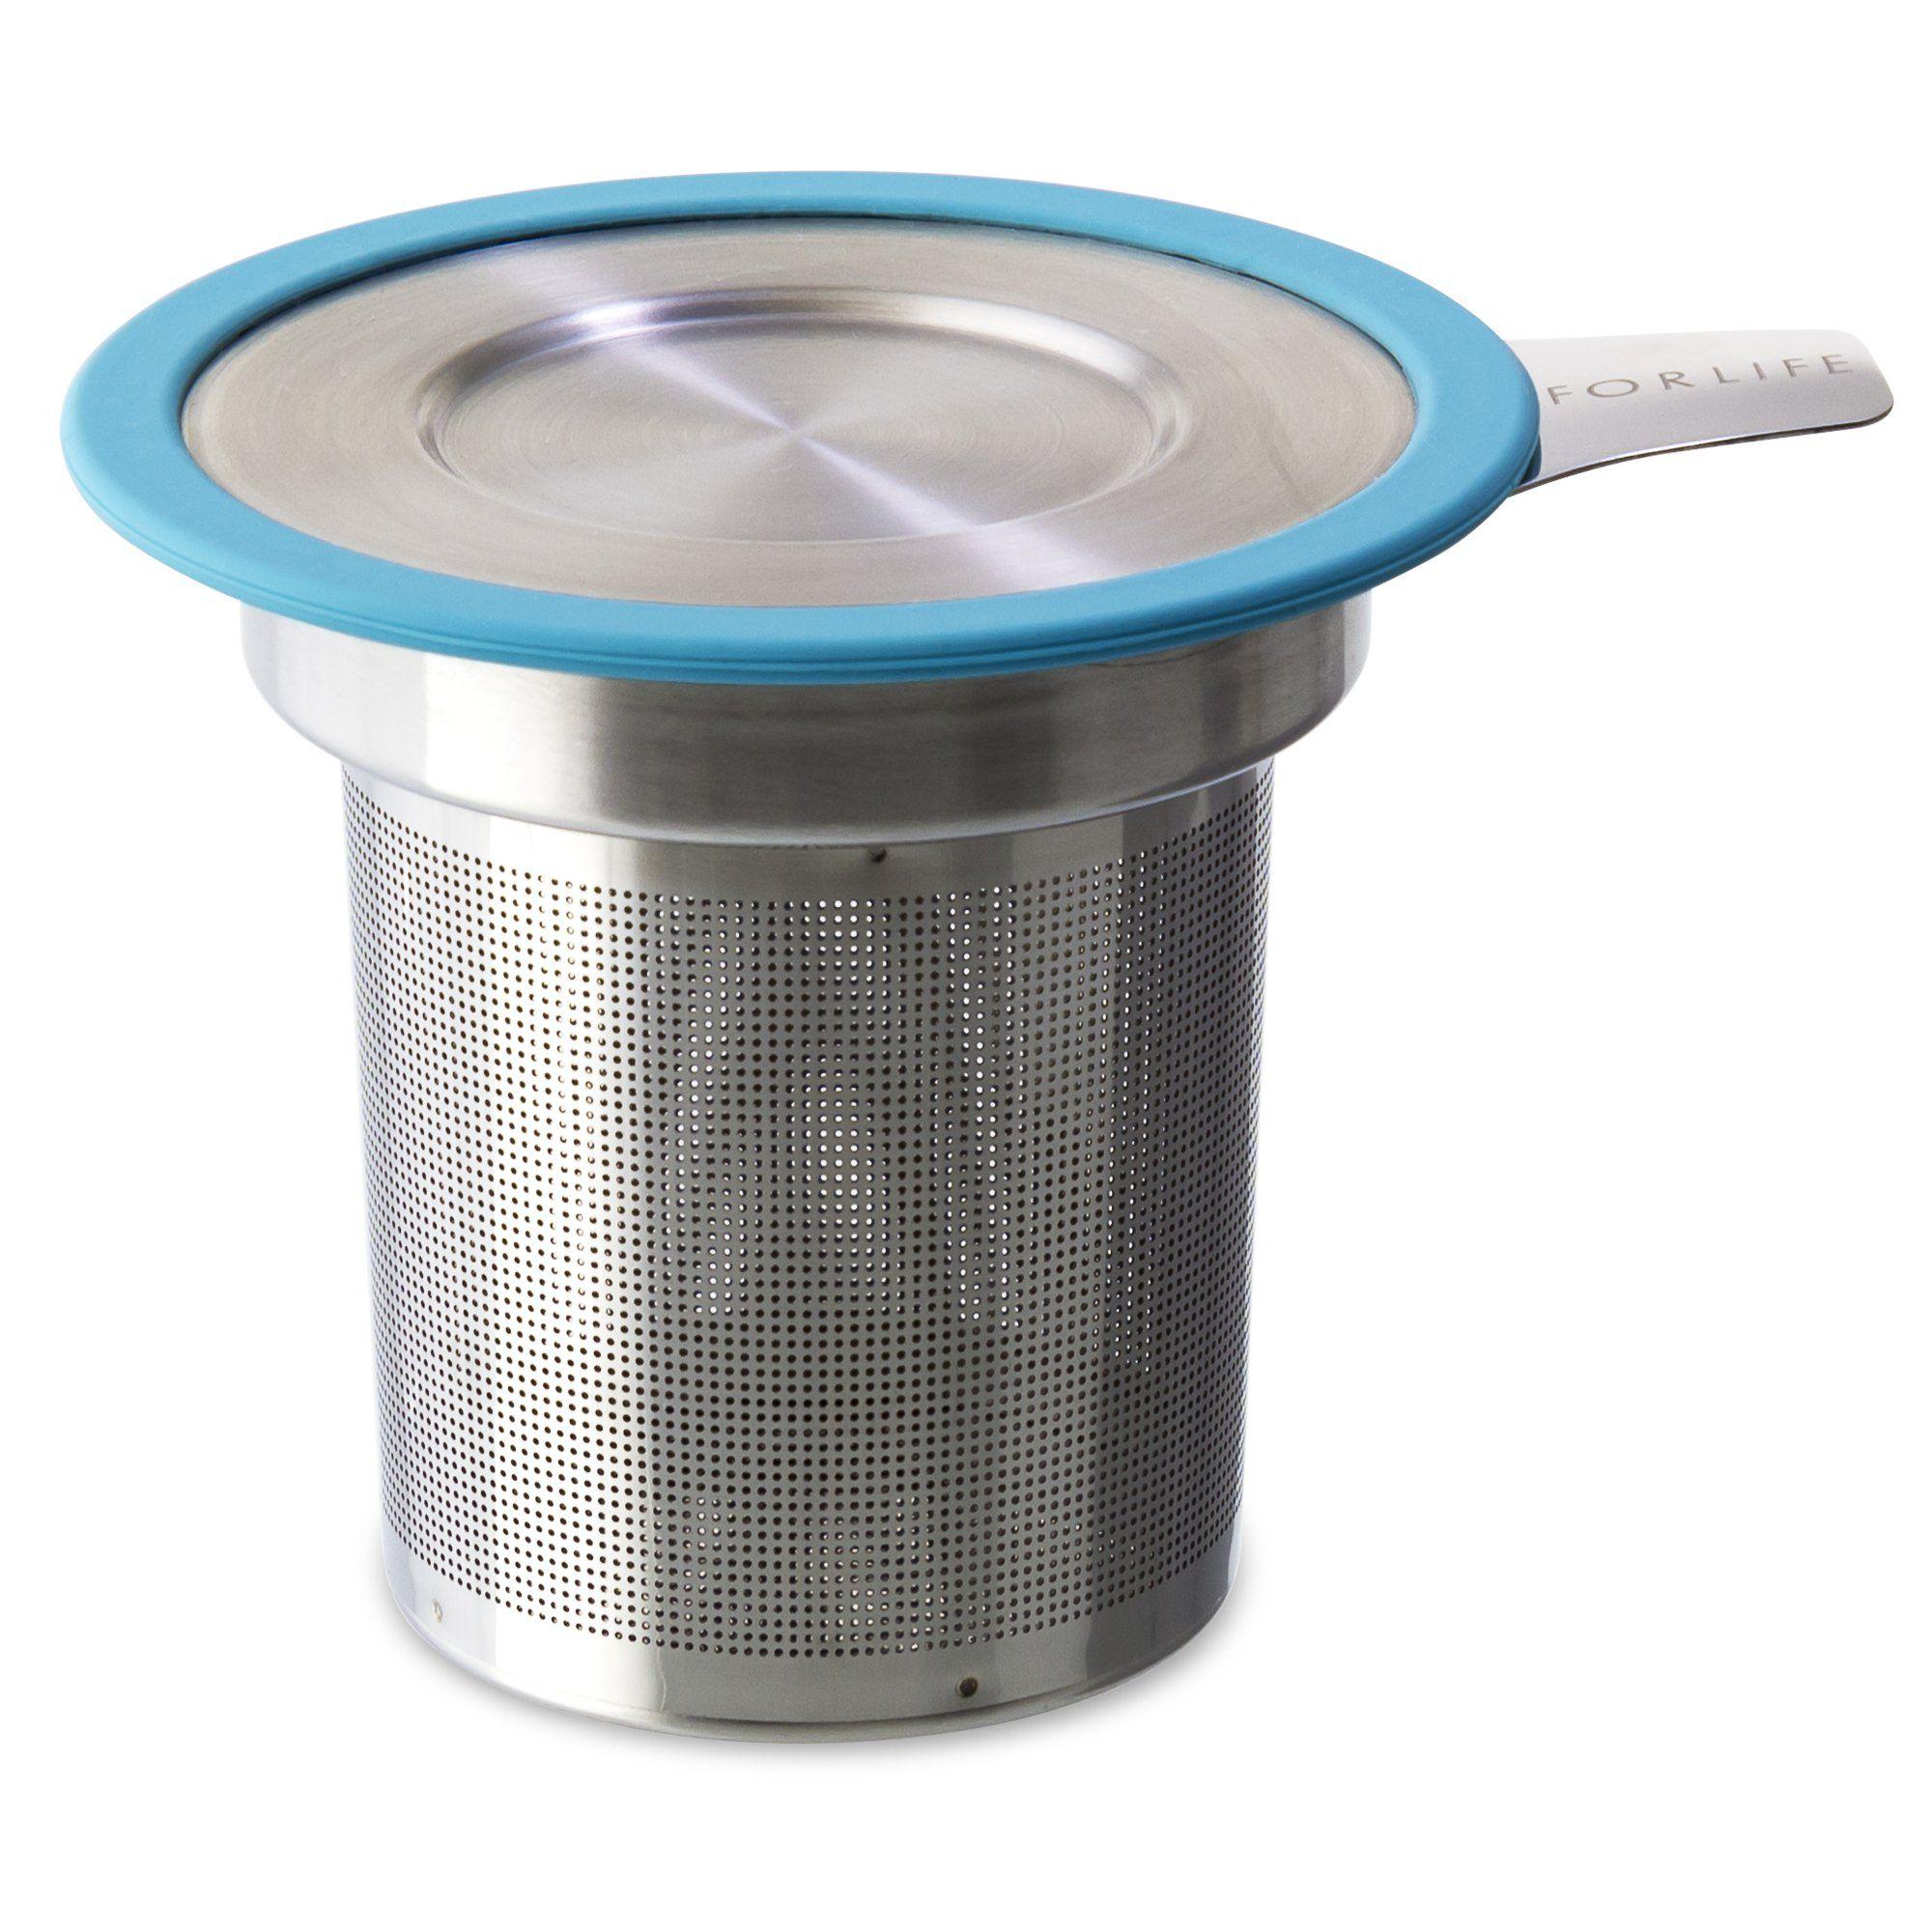 36+ Ultra fine tea strainer ideas